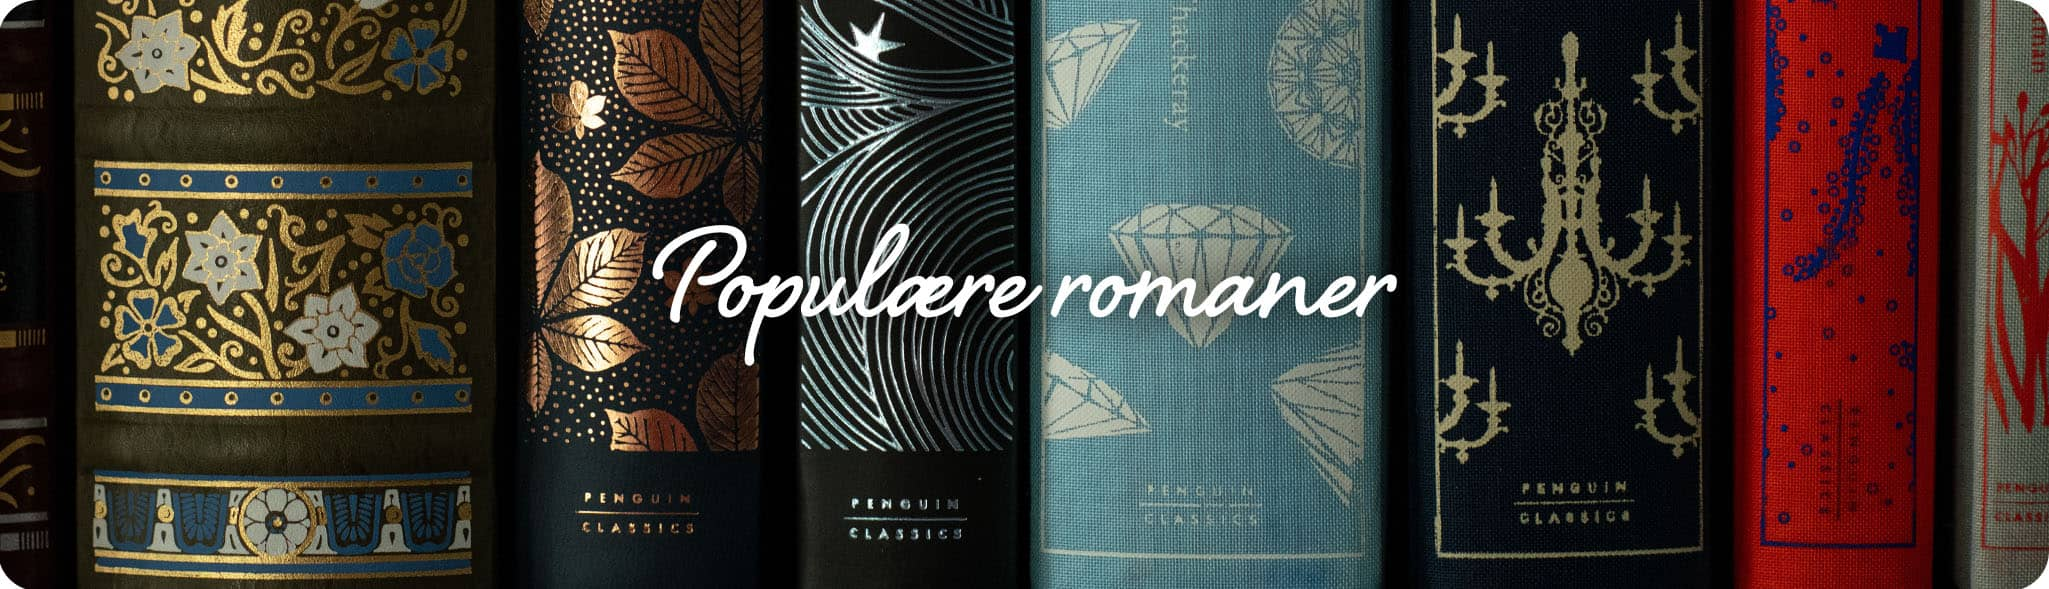 Tile bannere til populære romaner